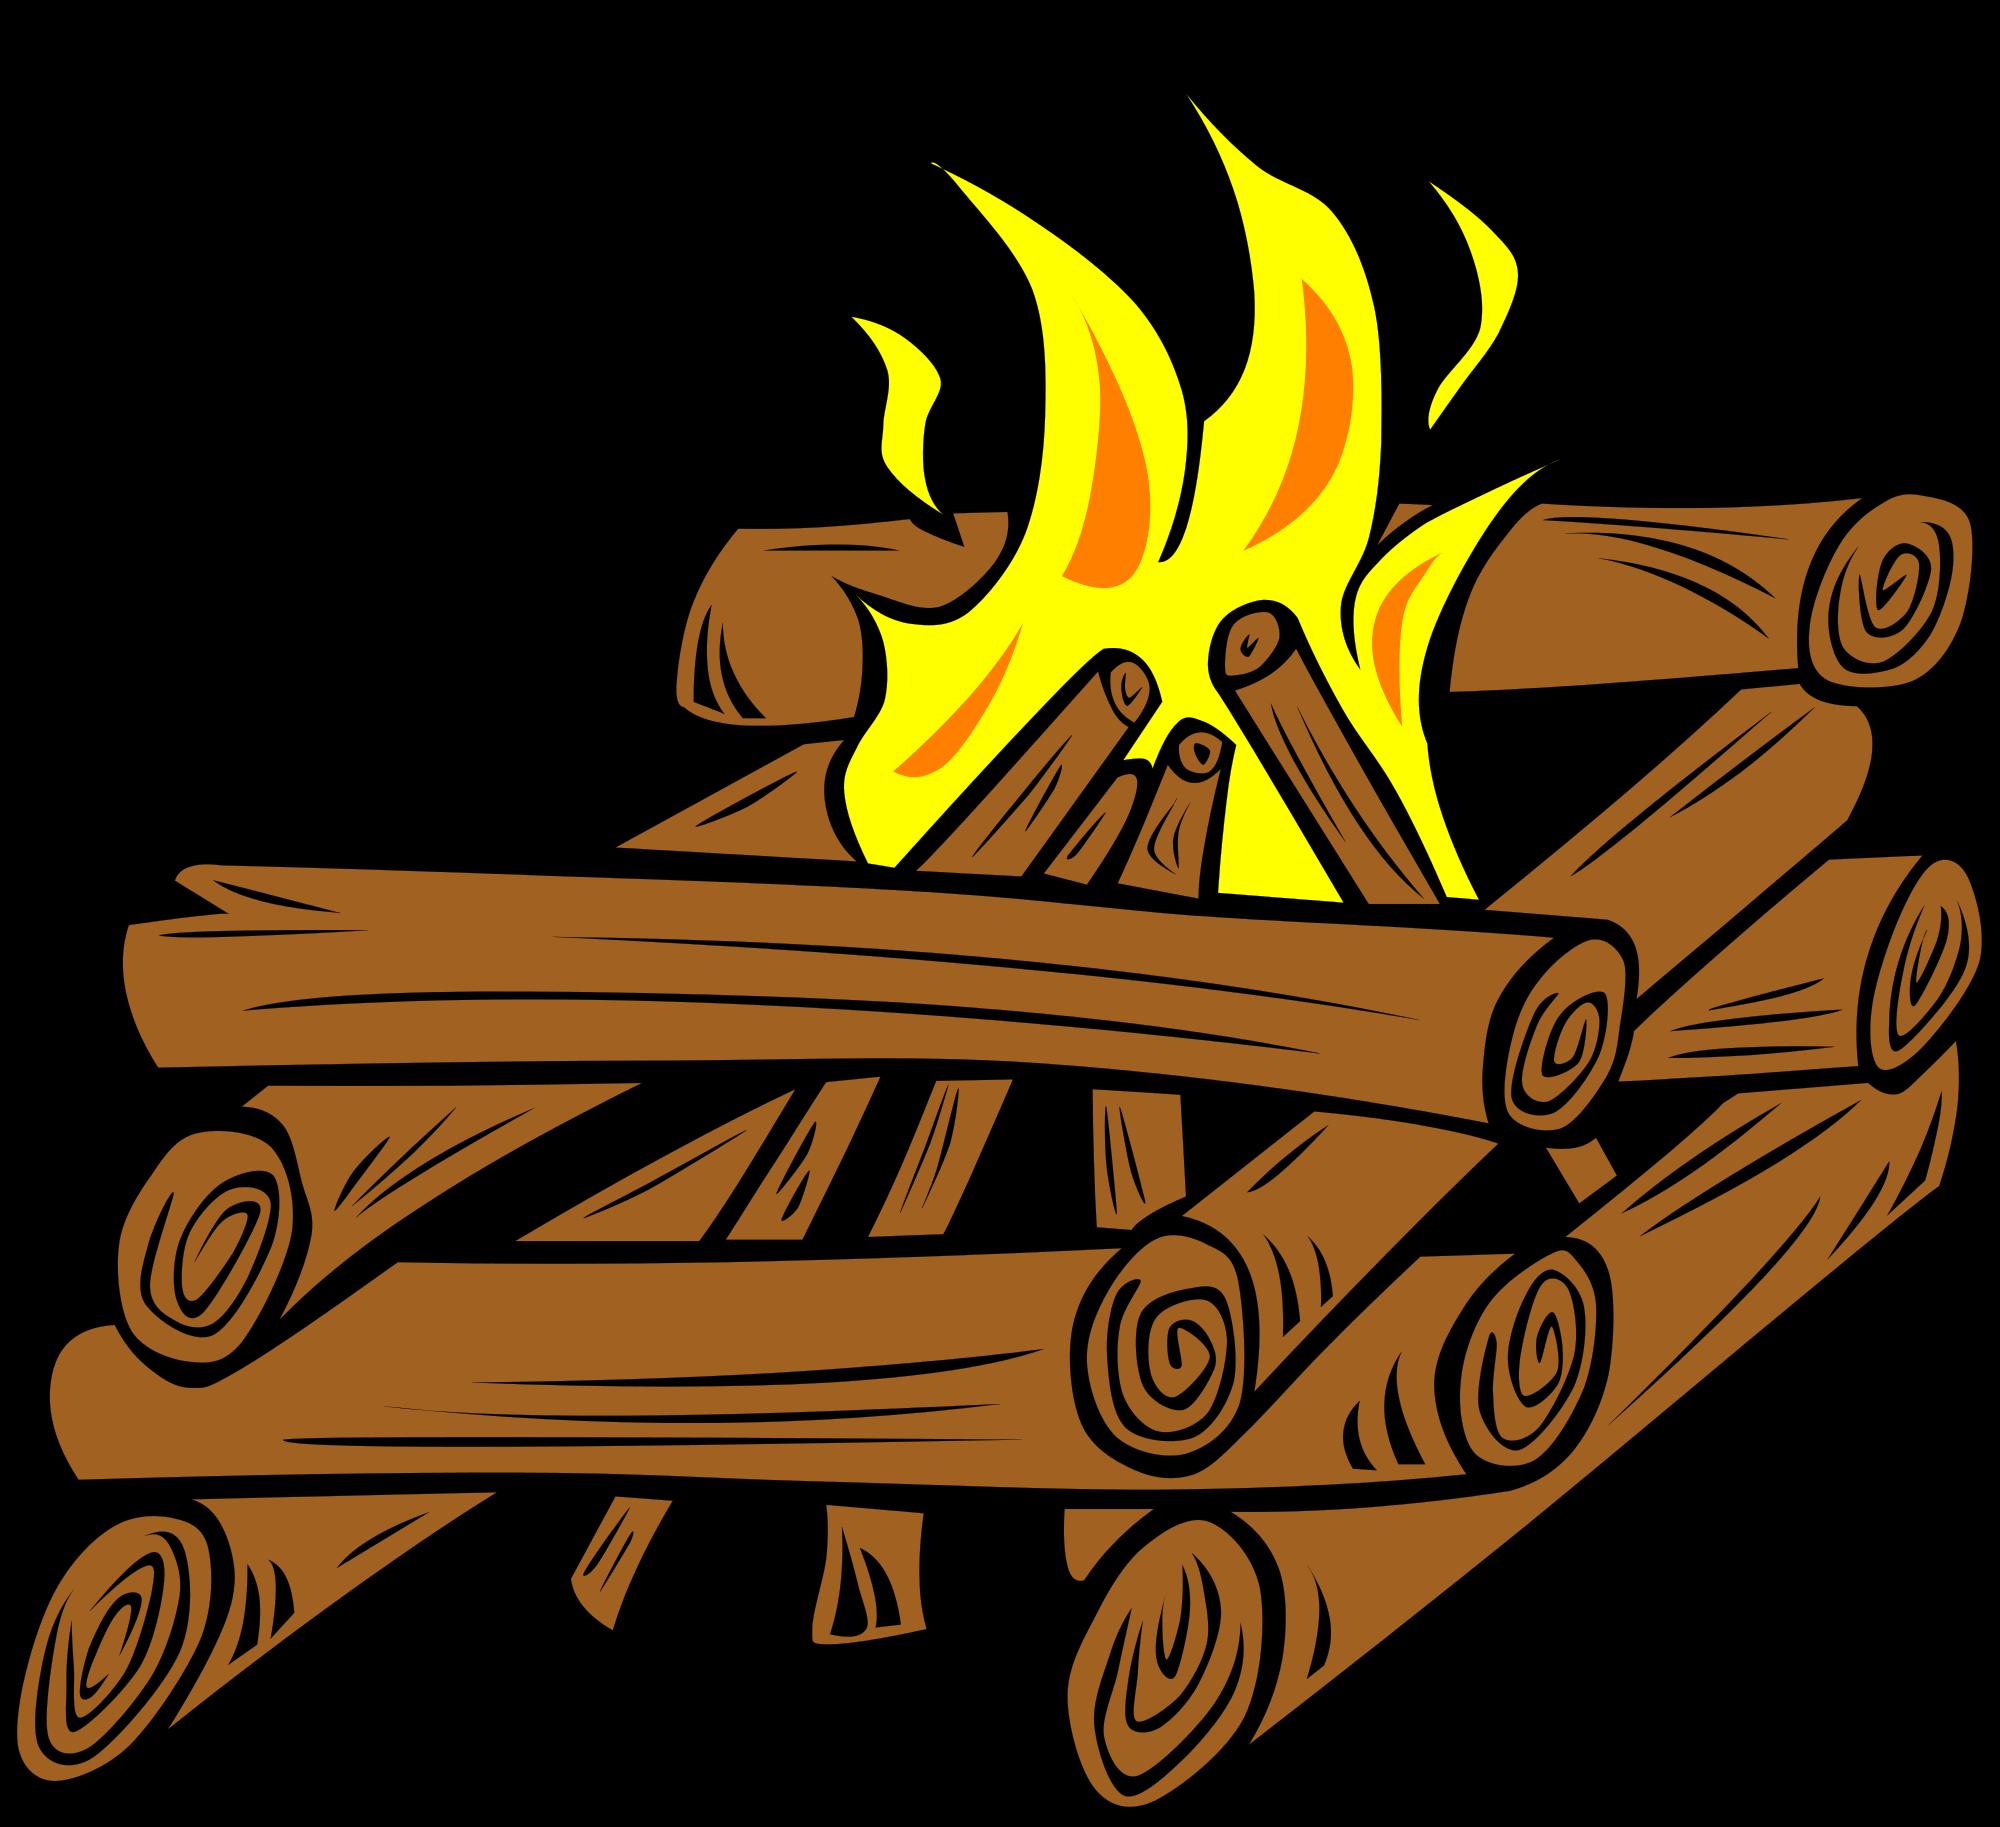 Fire clipart cartoon. Camp hot thing pencil